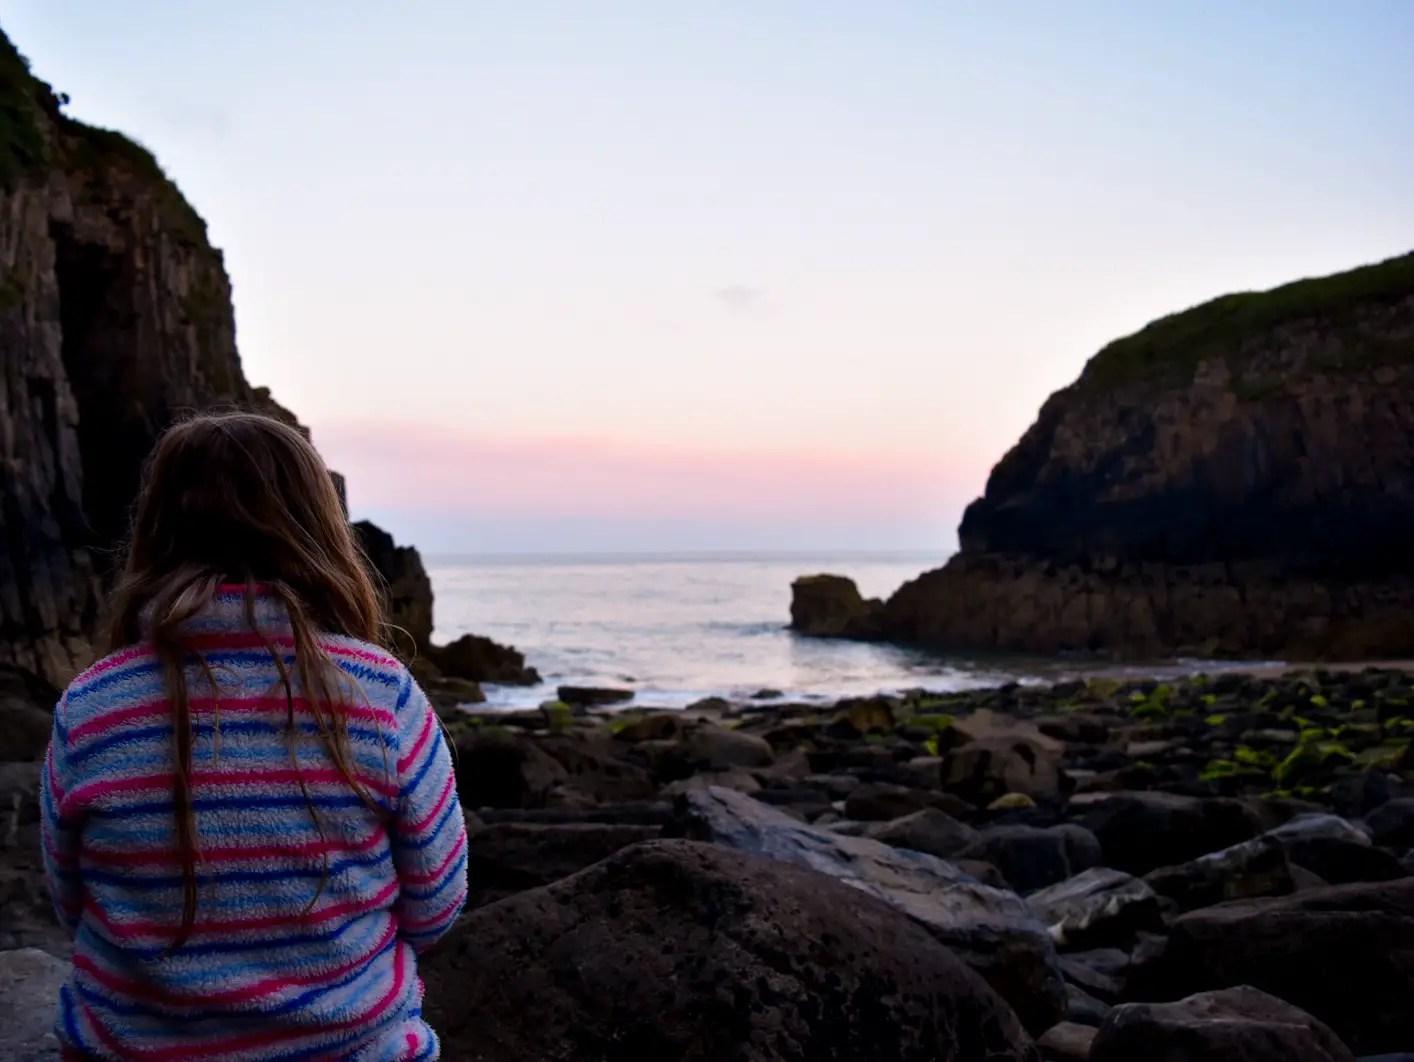 sunset at church doors cove Pembrokeshire